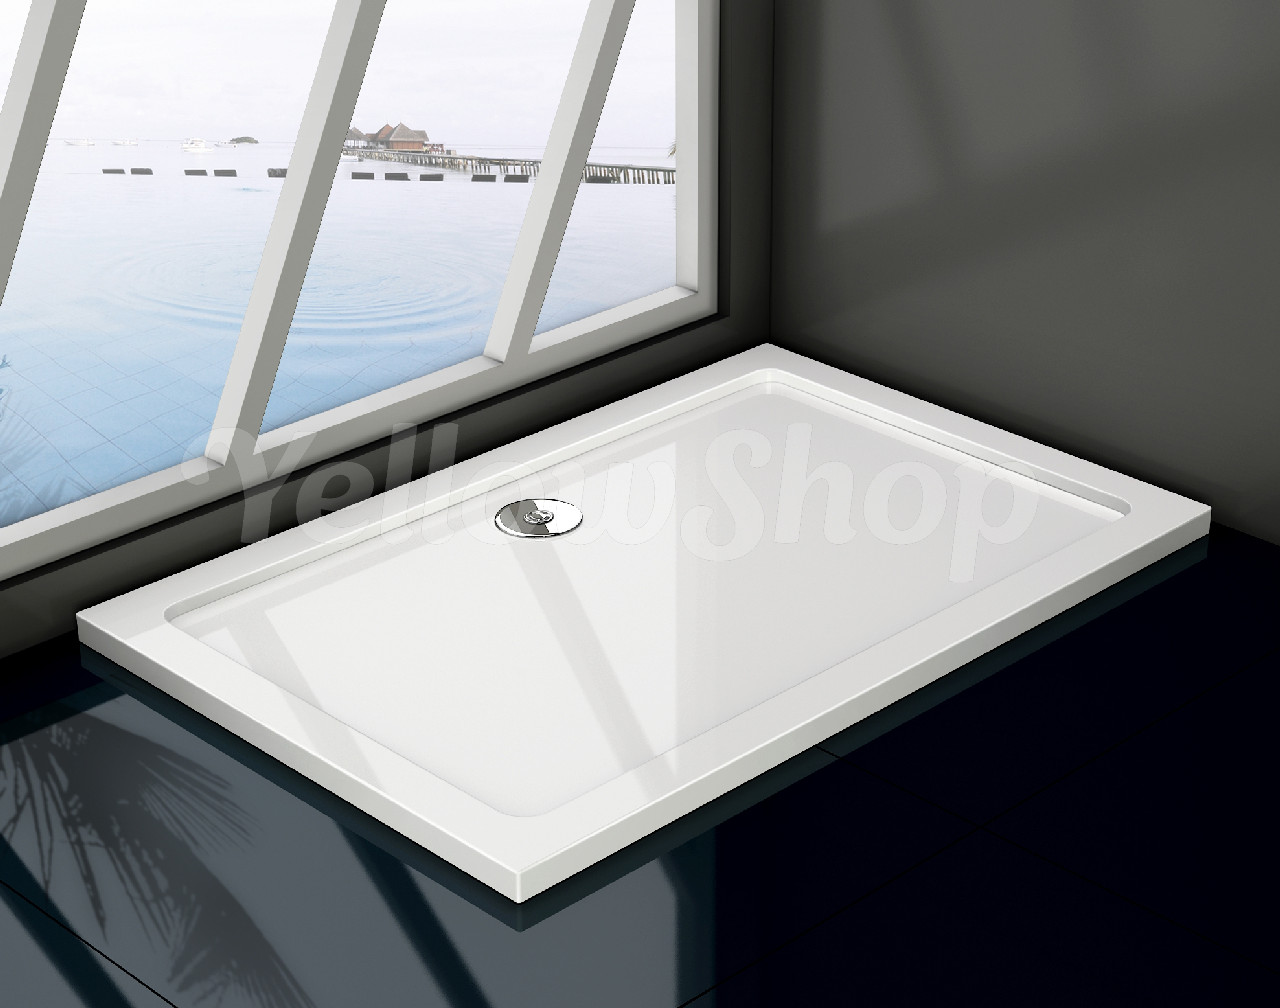 Piatto doccia resina massa piena slim sottile bianco rettangolare